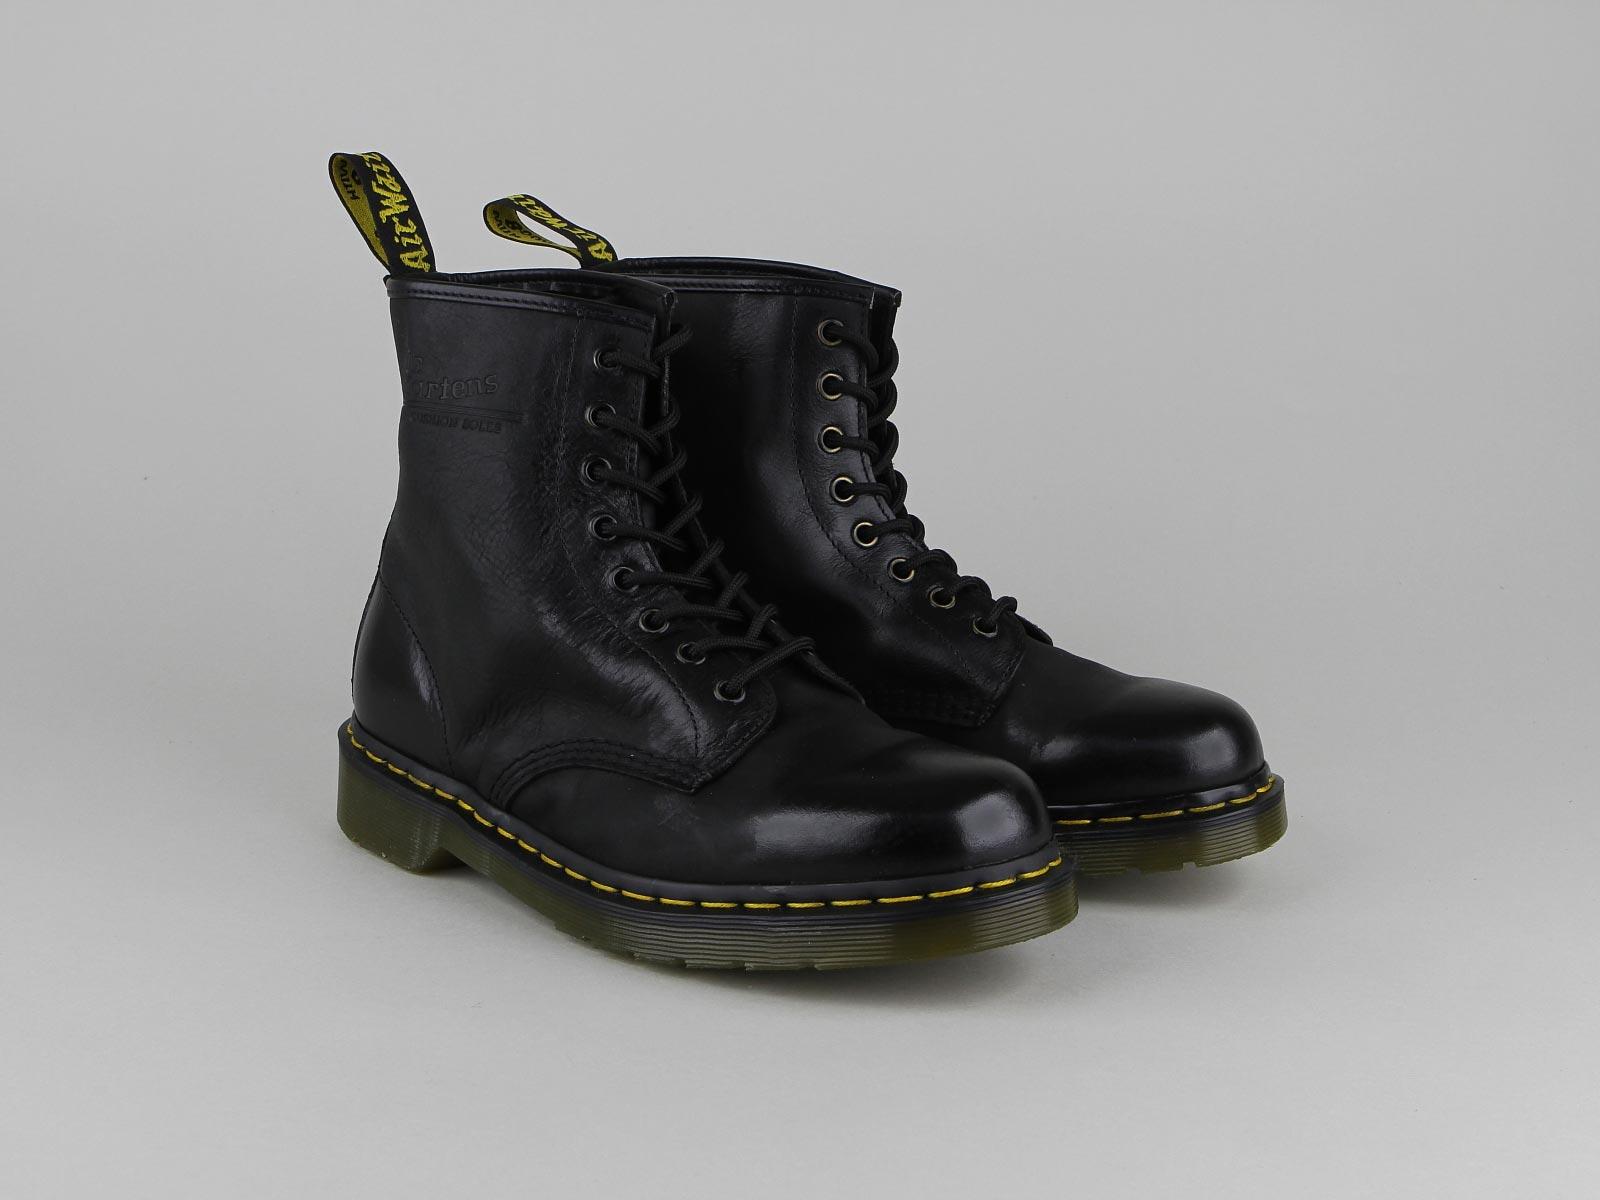 doc martens homme mes chaussures hautes. Black Bedroom Furniture Sets. Home Design Ideas